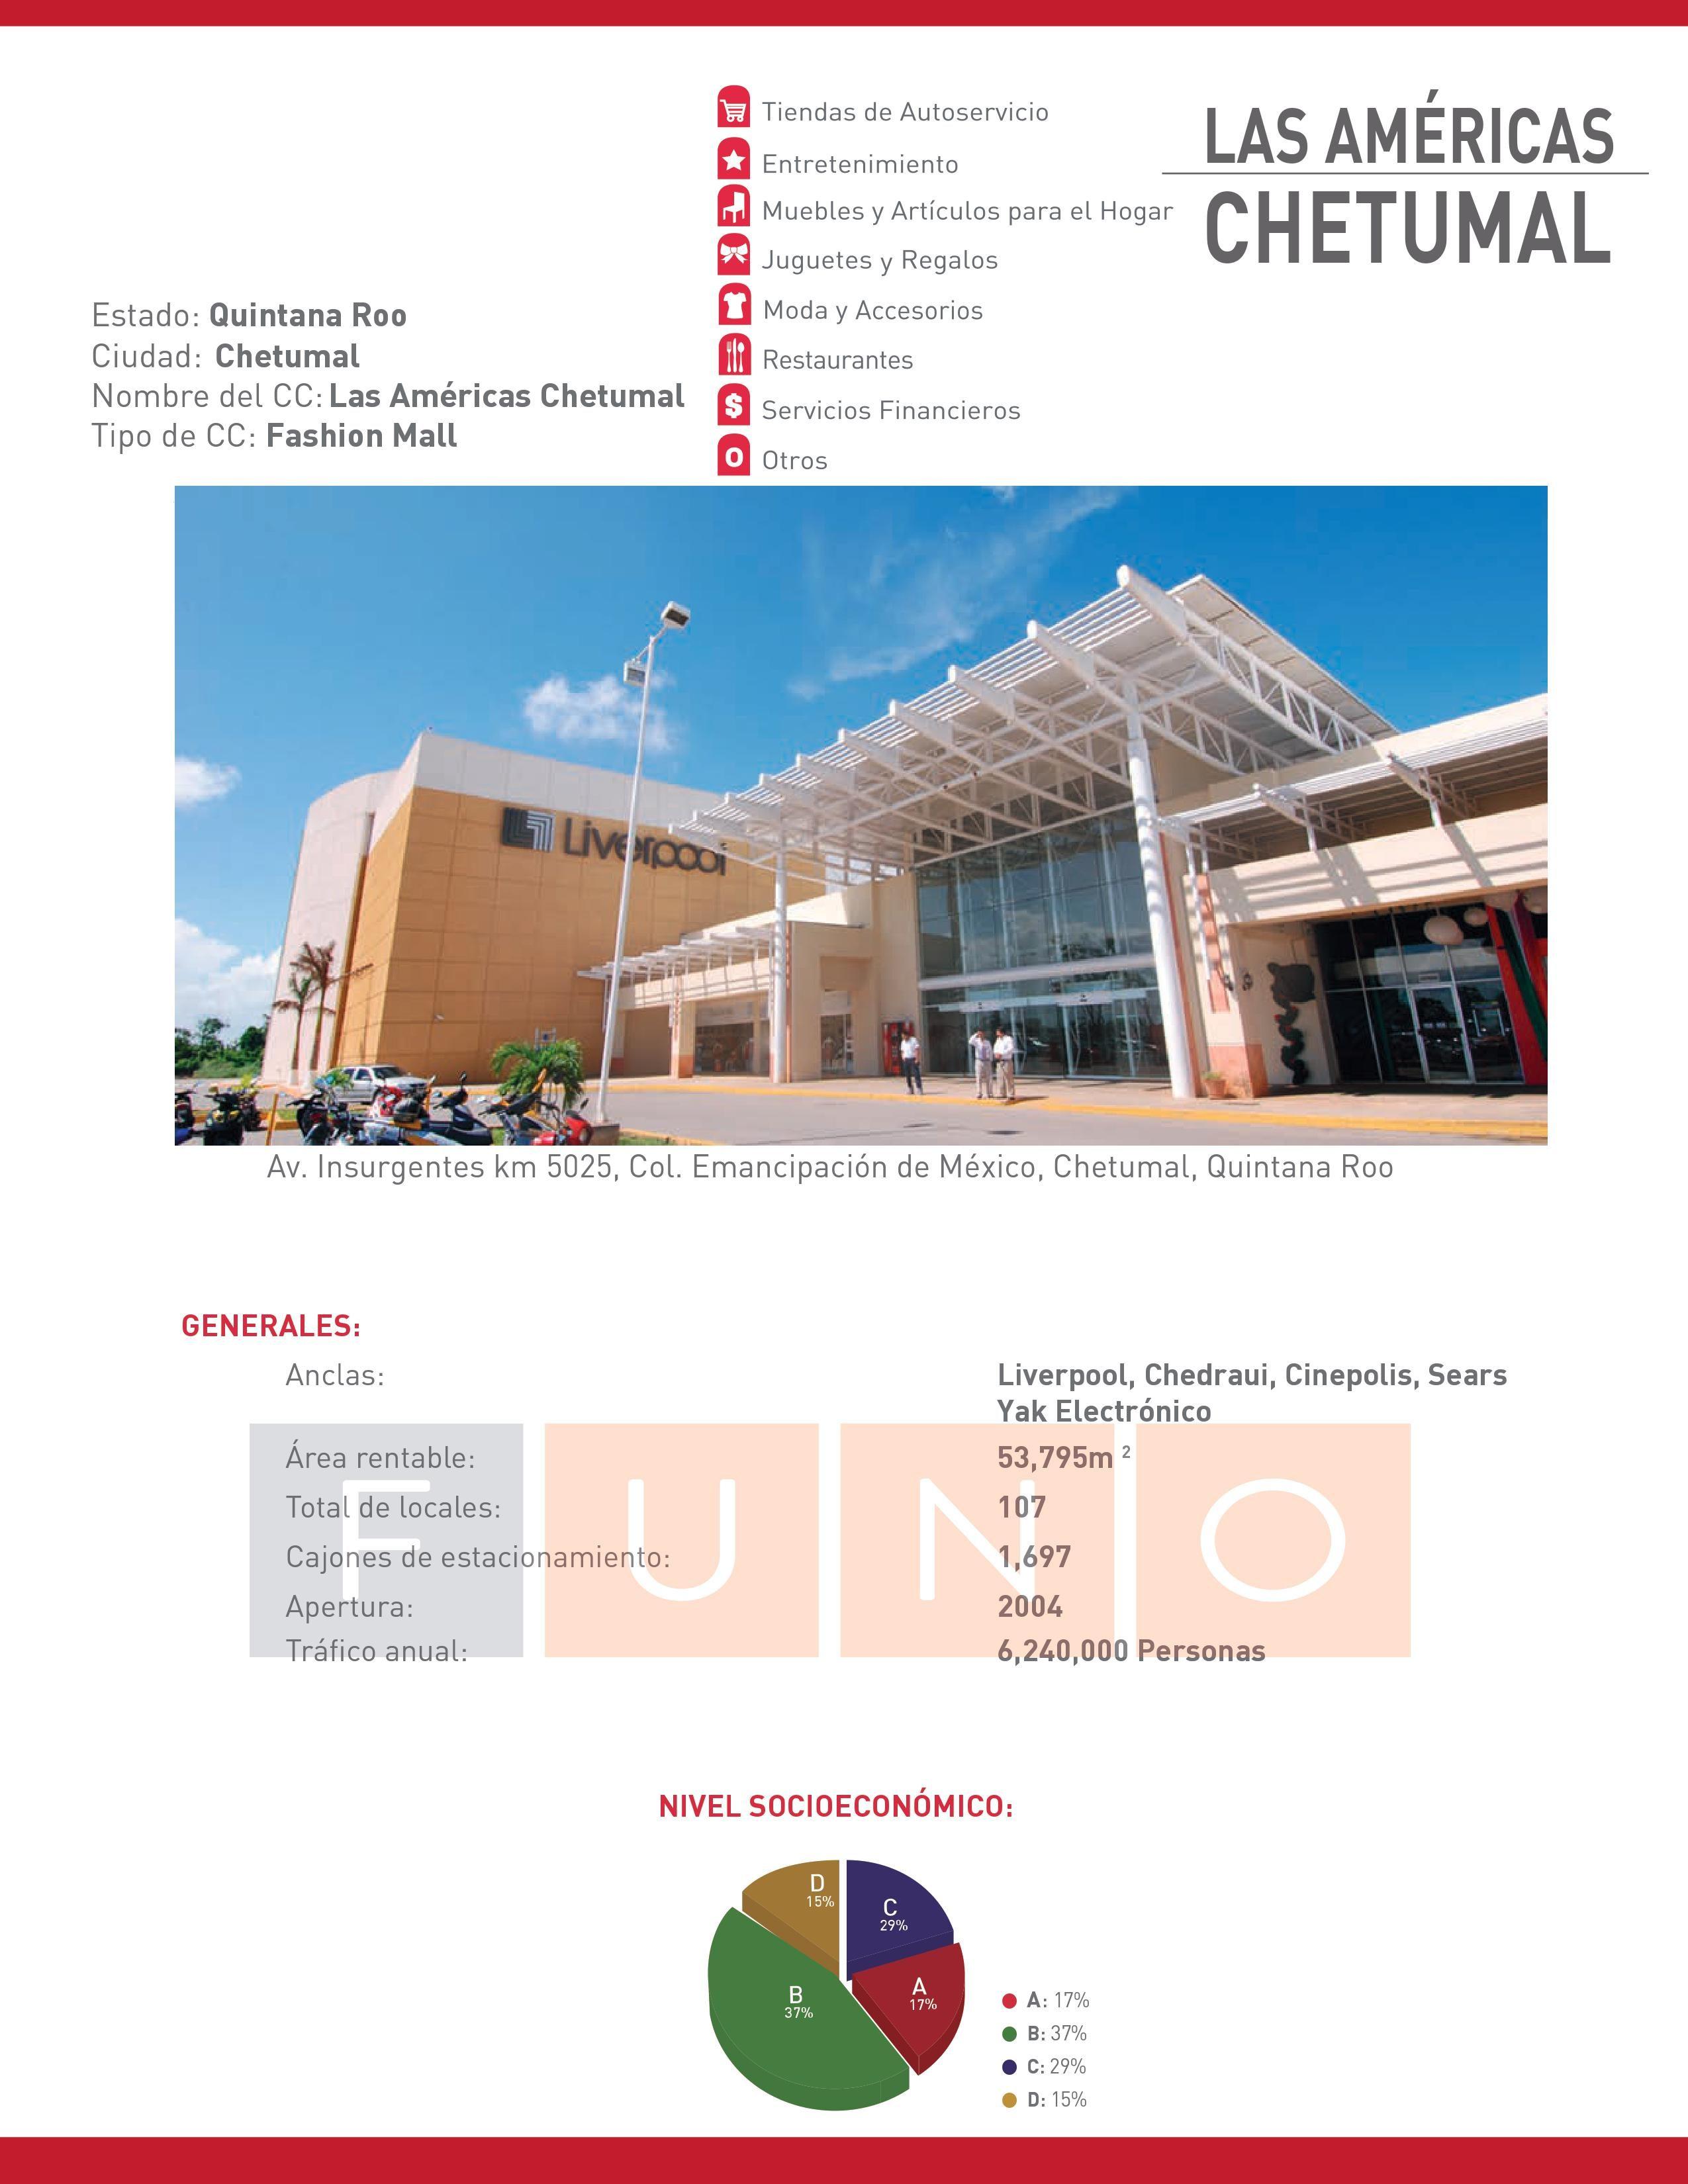 Co-Brochure Las Américas Chetumal (1)